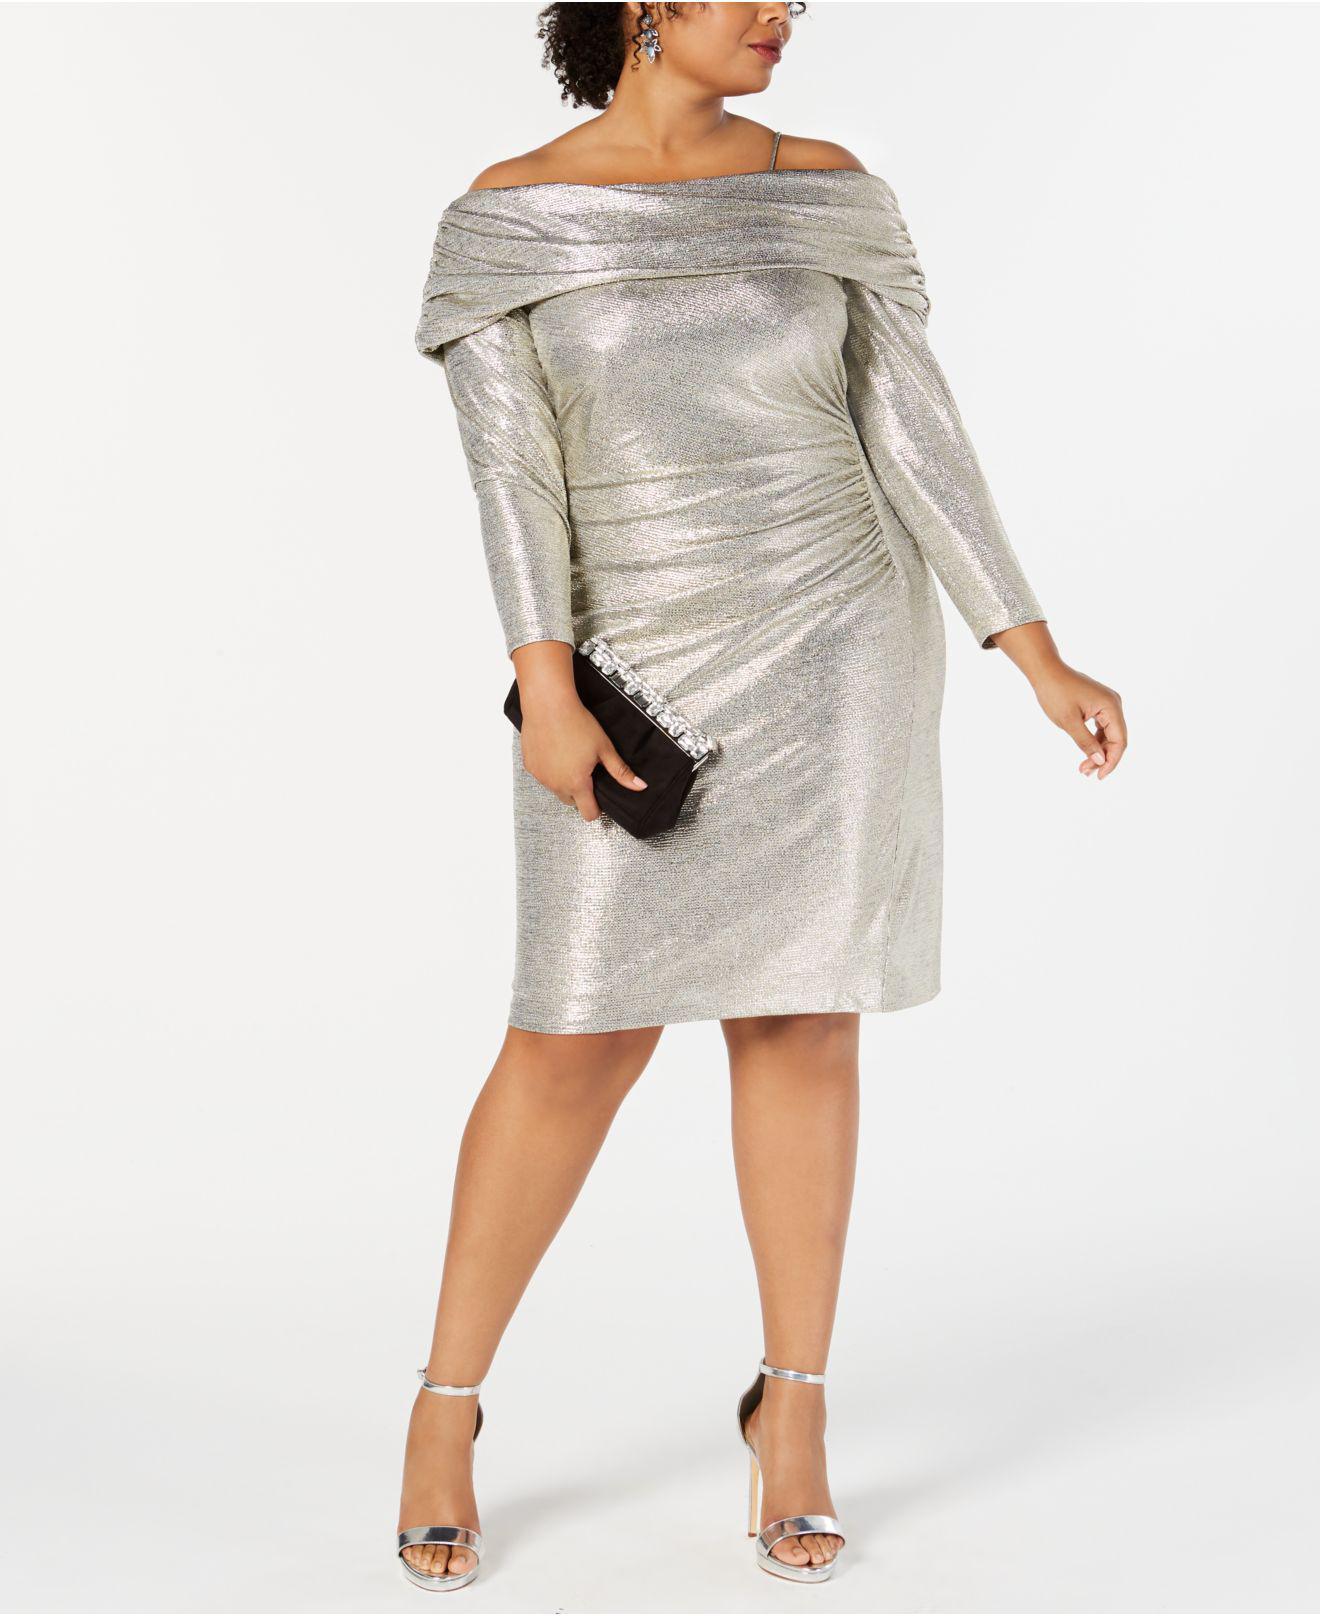 aede81479c8 Lyst - Betsy   Adam Plus Size Metallic Off-the-shoulder Sheath Dress ...